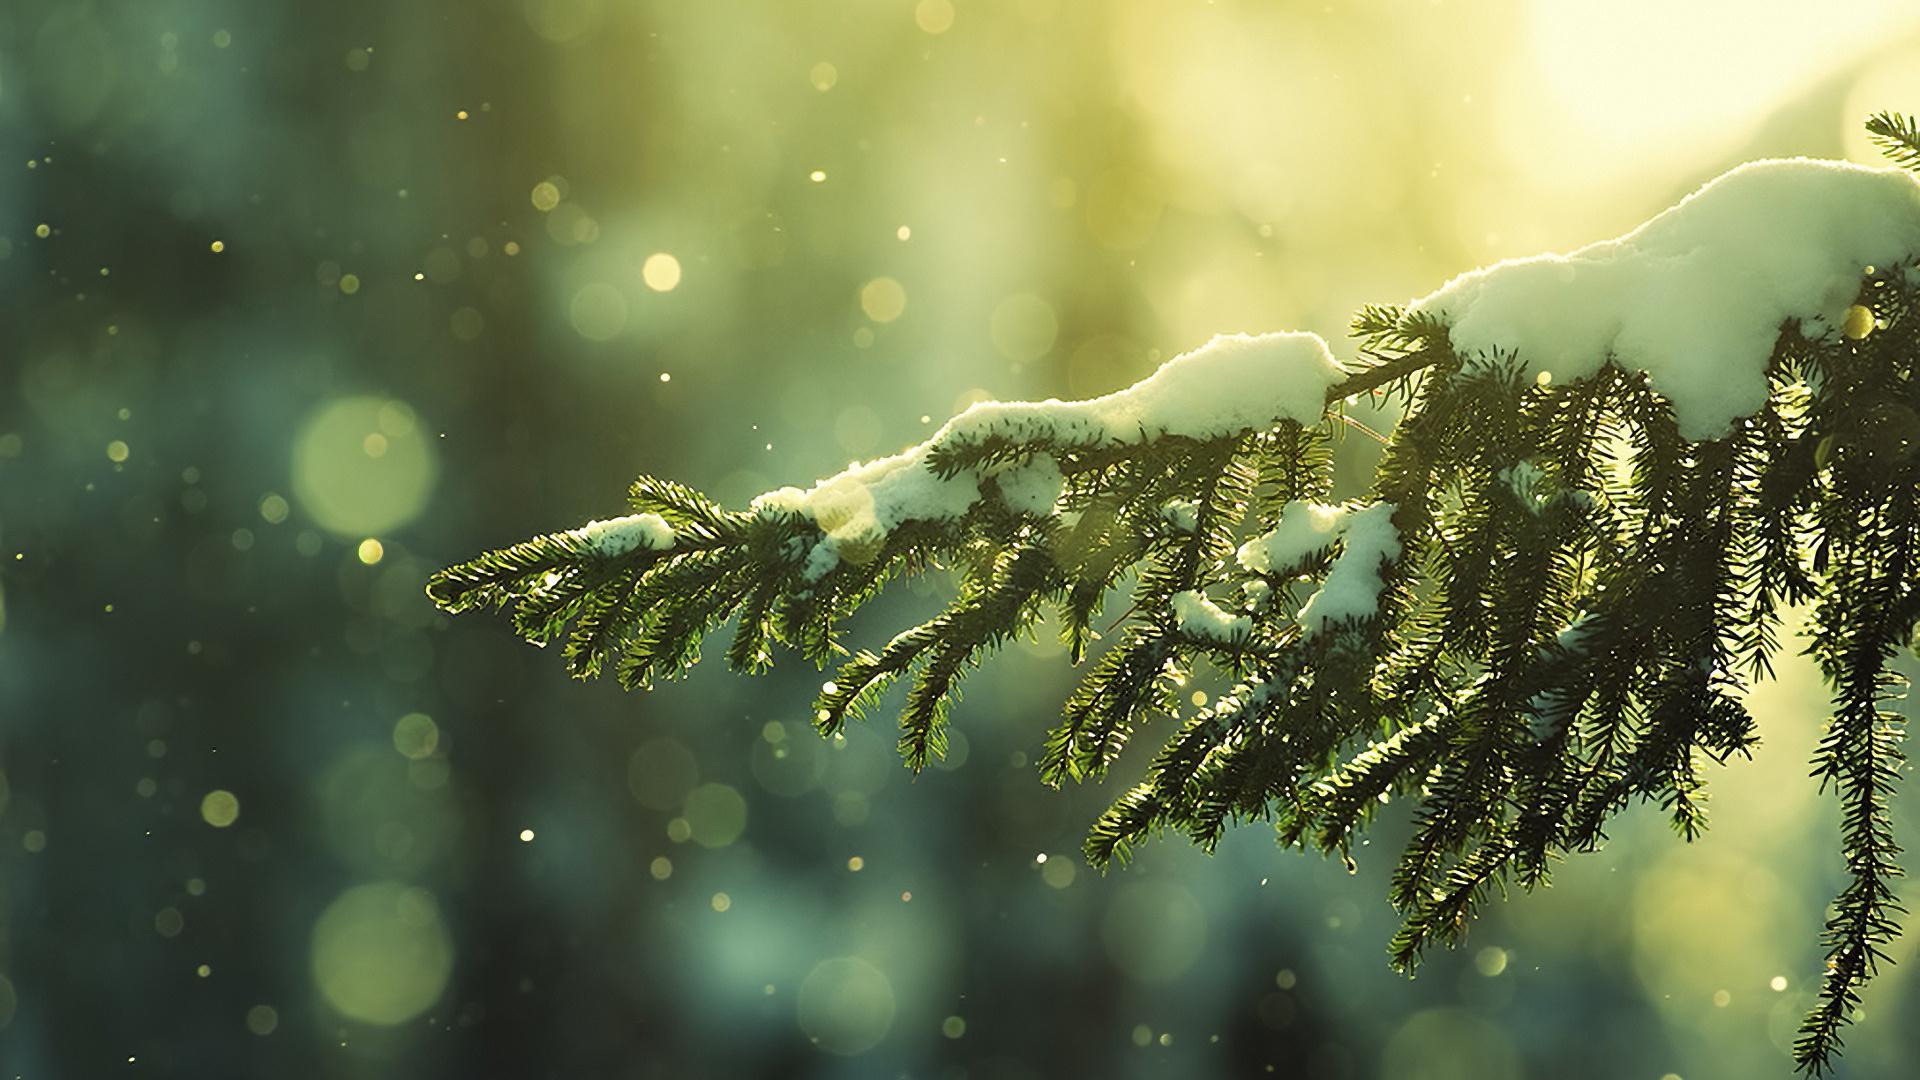 Winter Nights and Christmas Lights 1920x1080